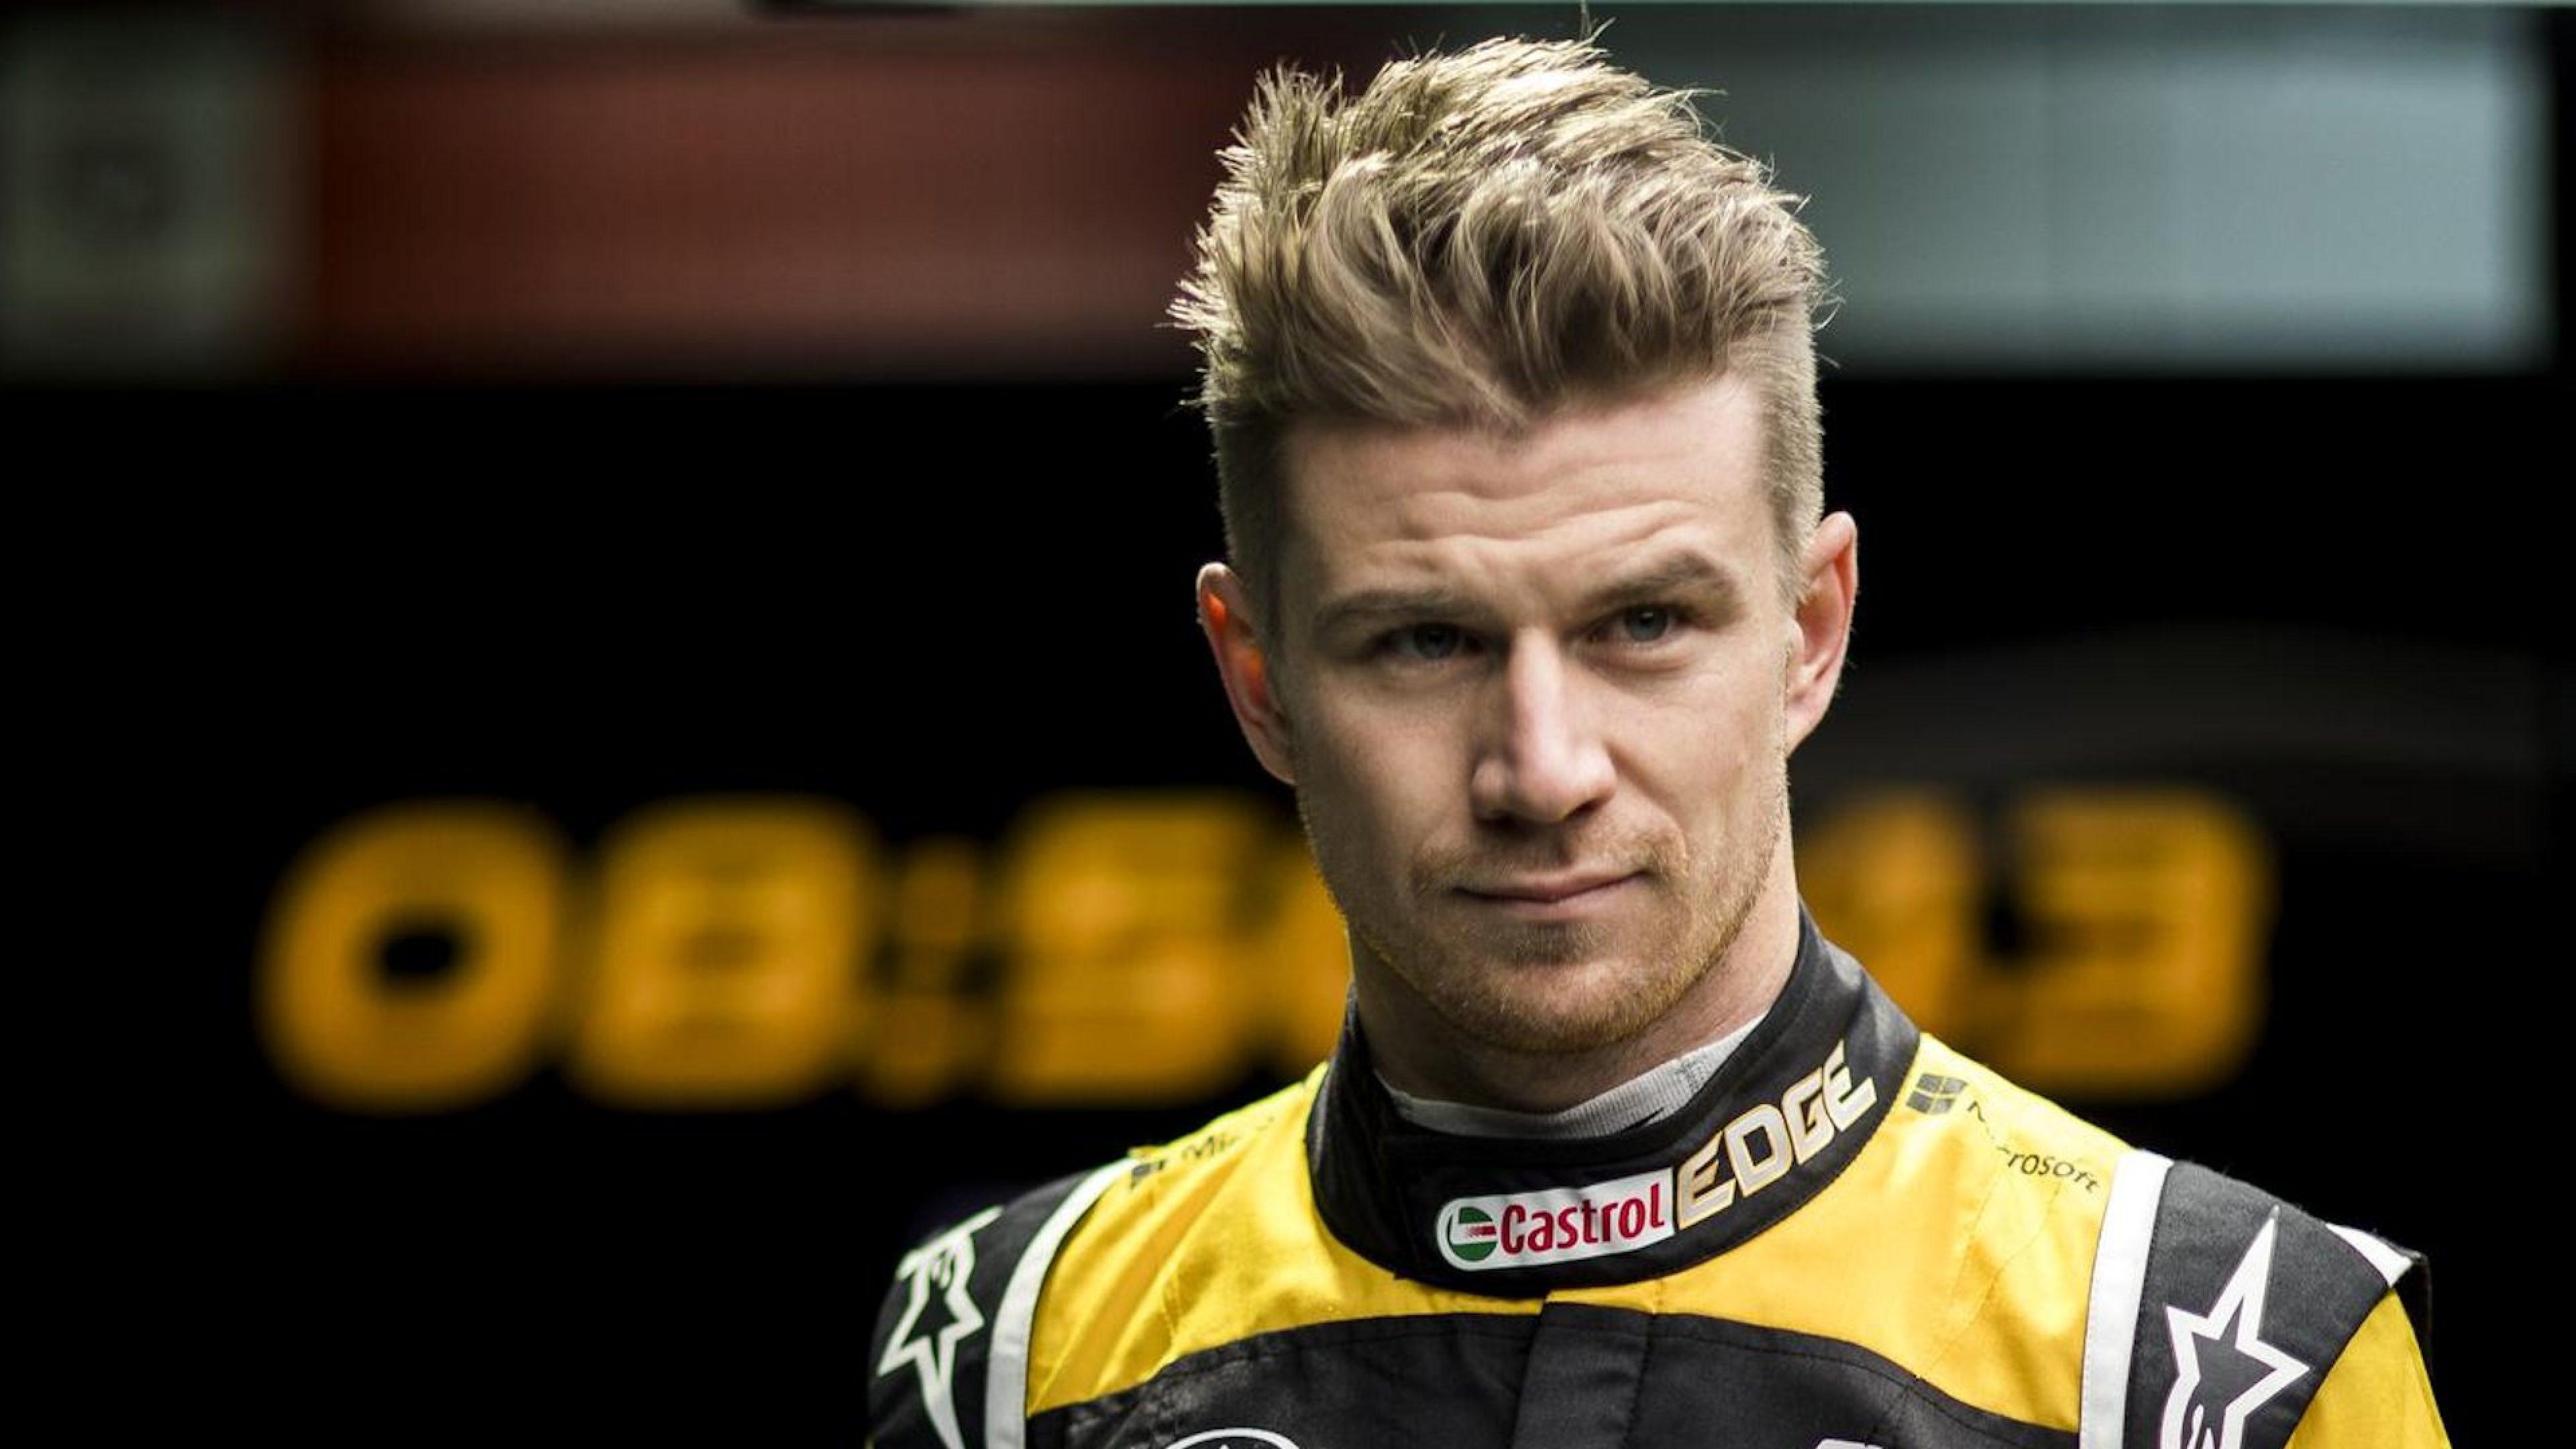 Il pilota del Venerdì: Nico Hulkenberg